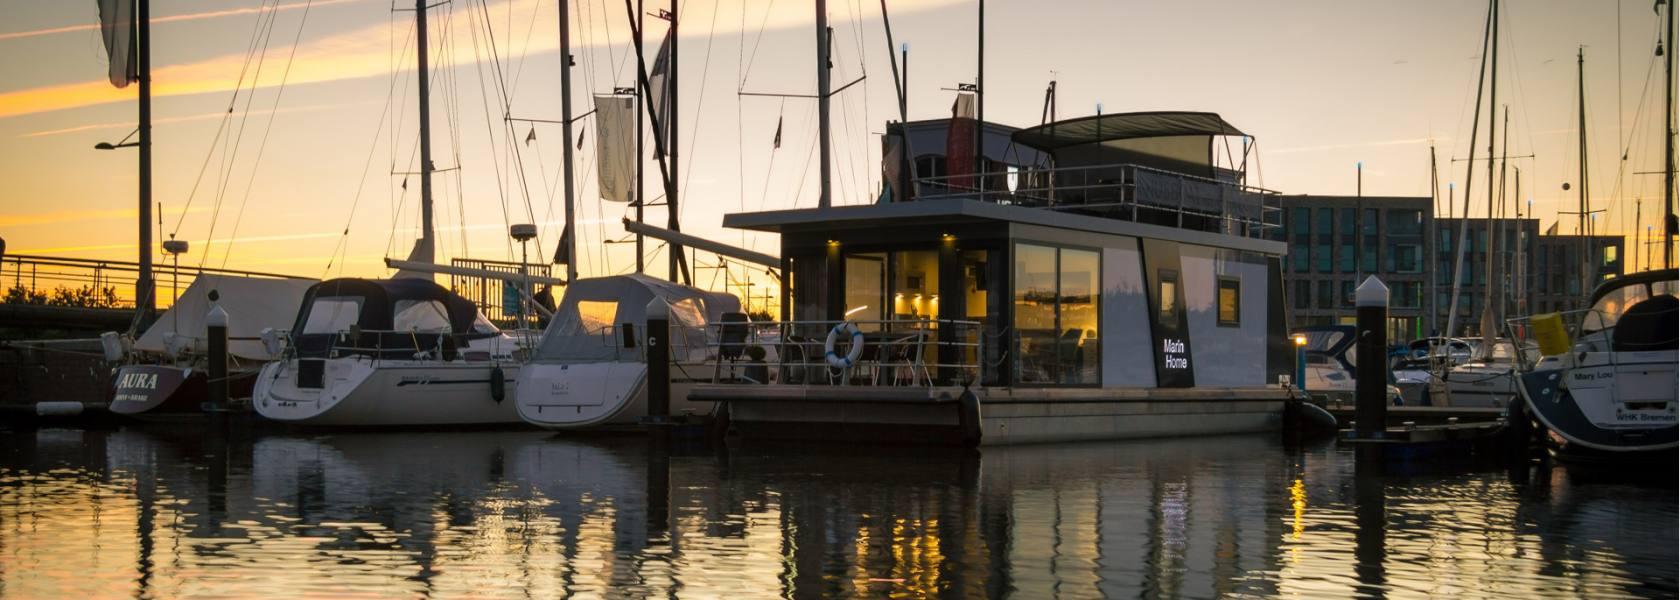 Hausboot im Fischereihafen, © Husboat erleben GbR